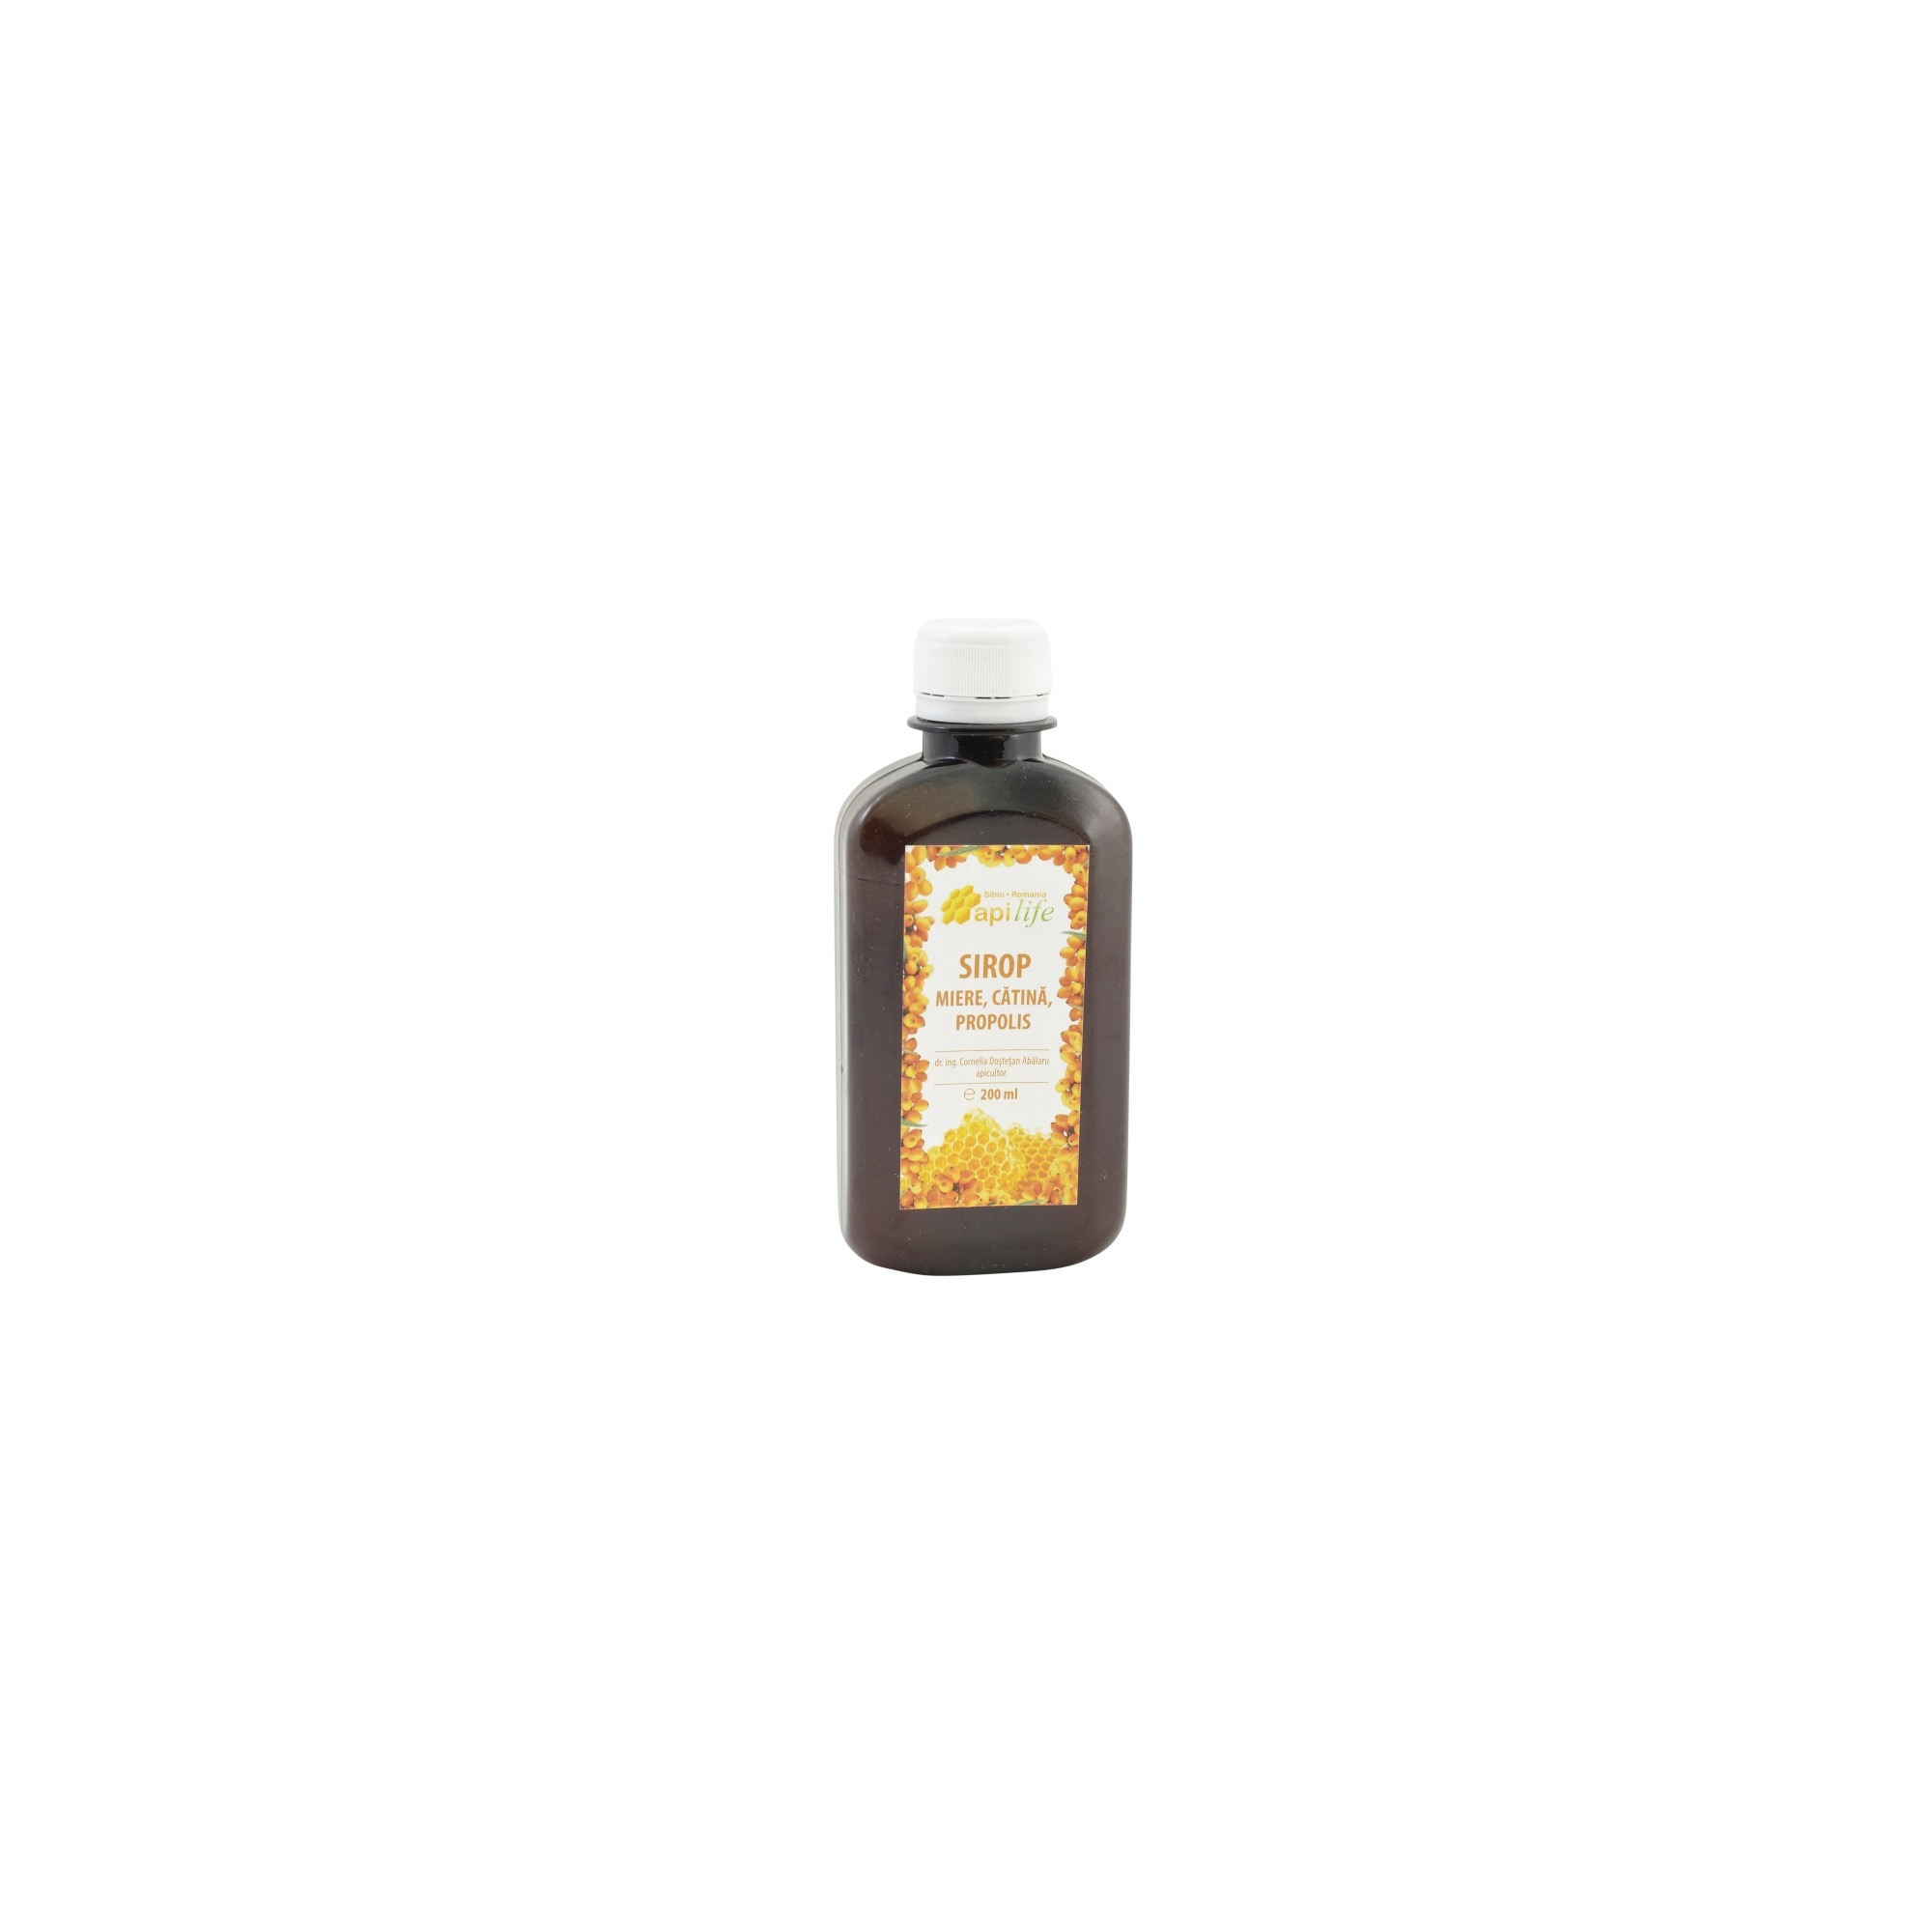 detoxifiere cu tinctura de propolis